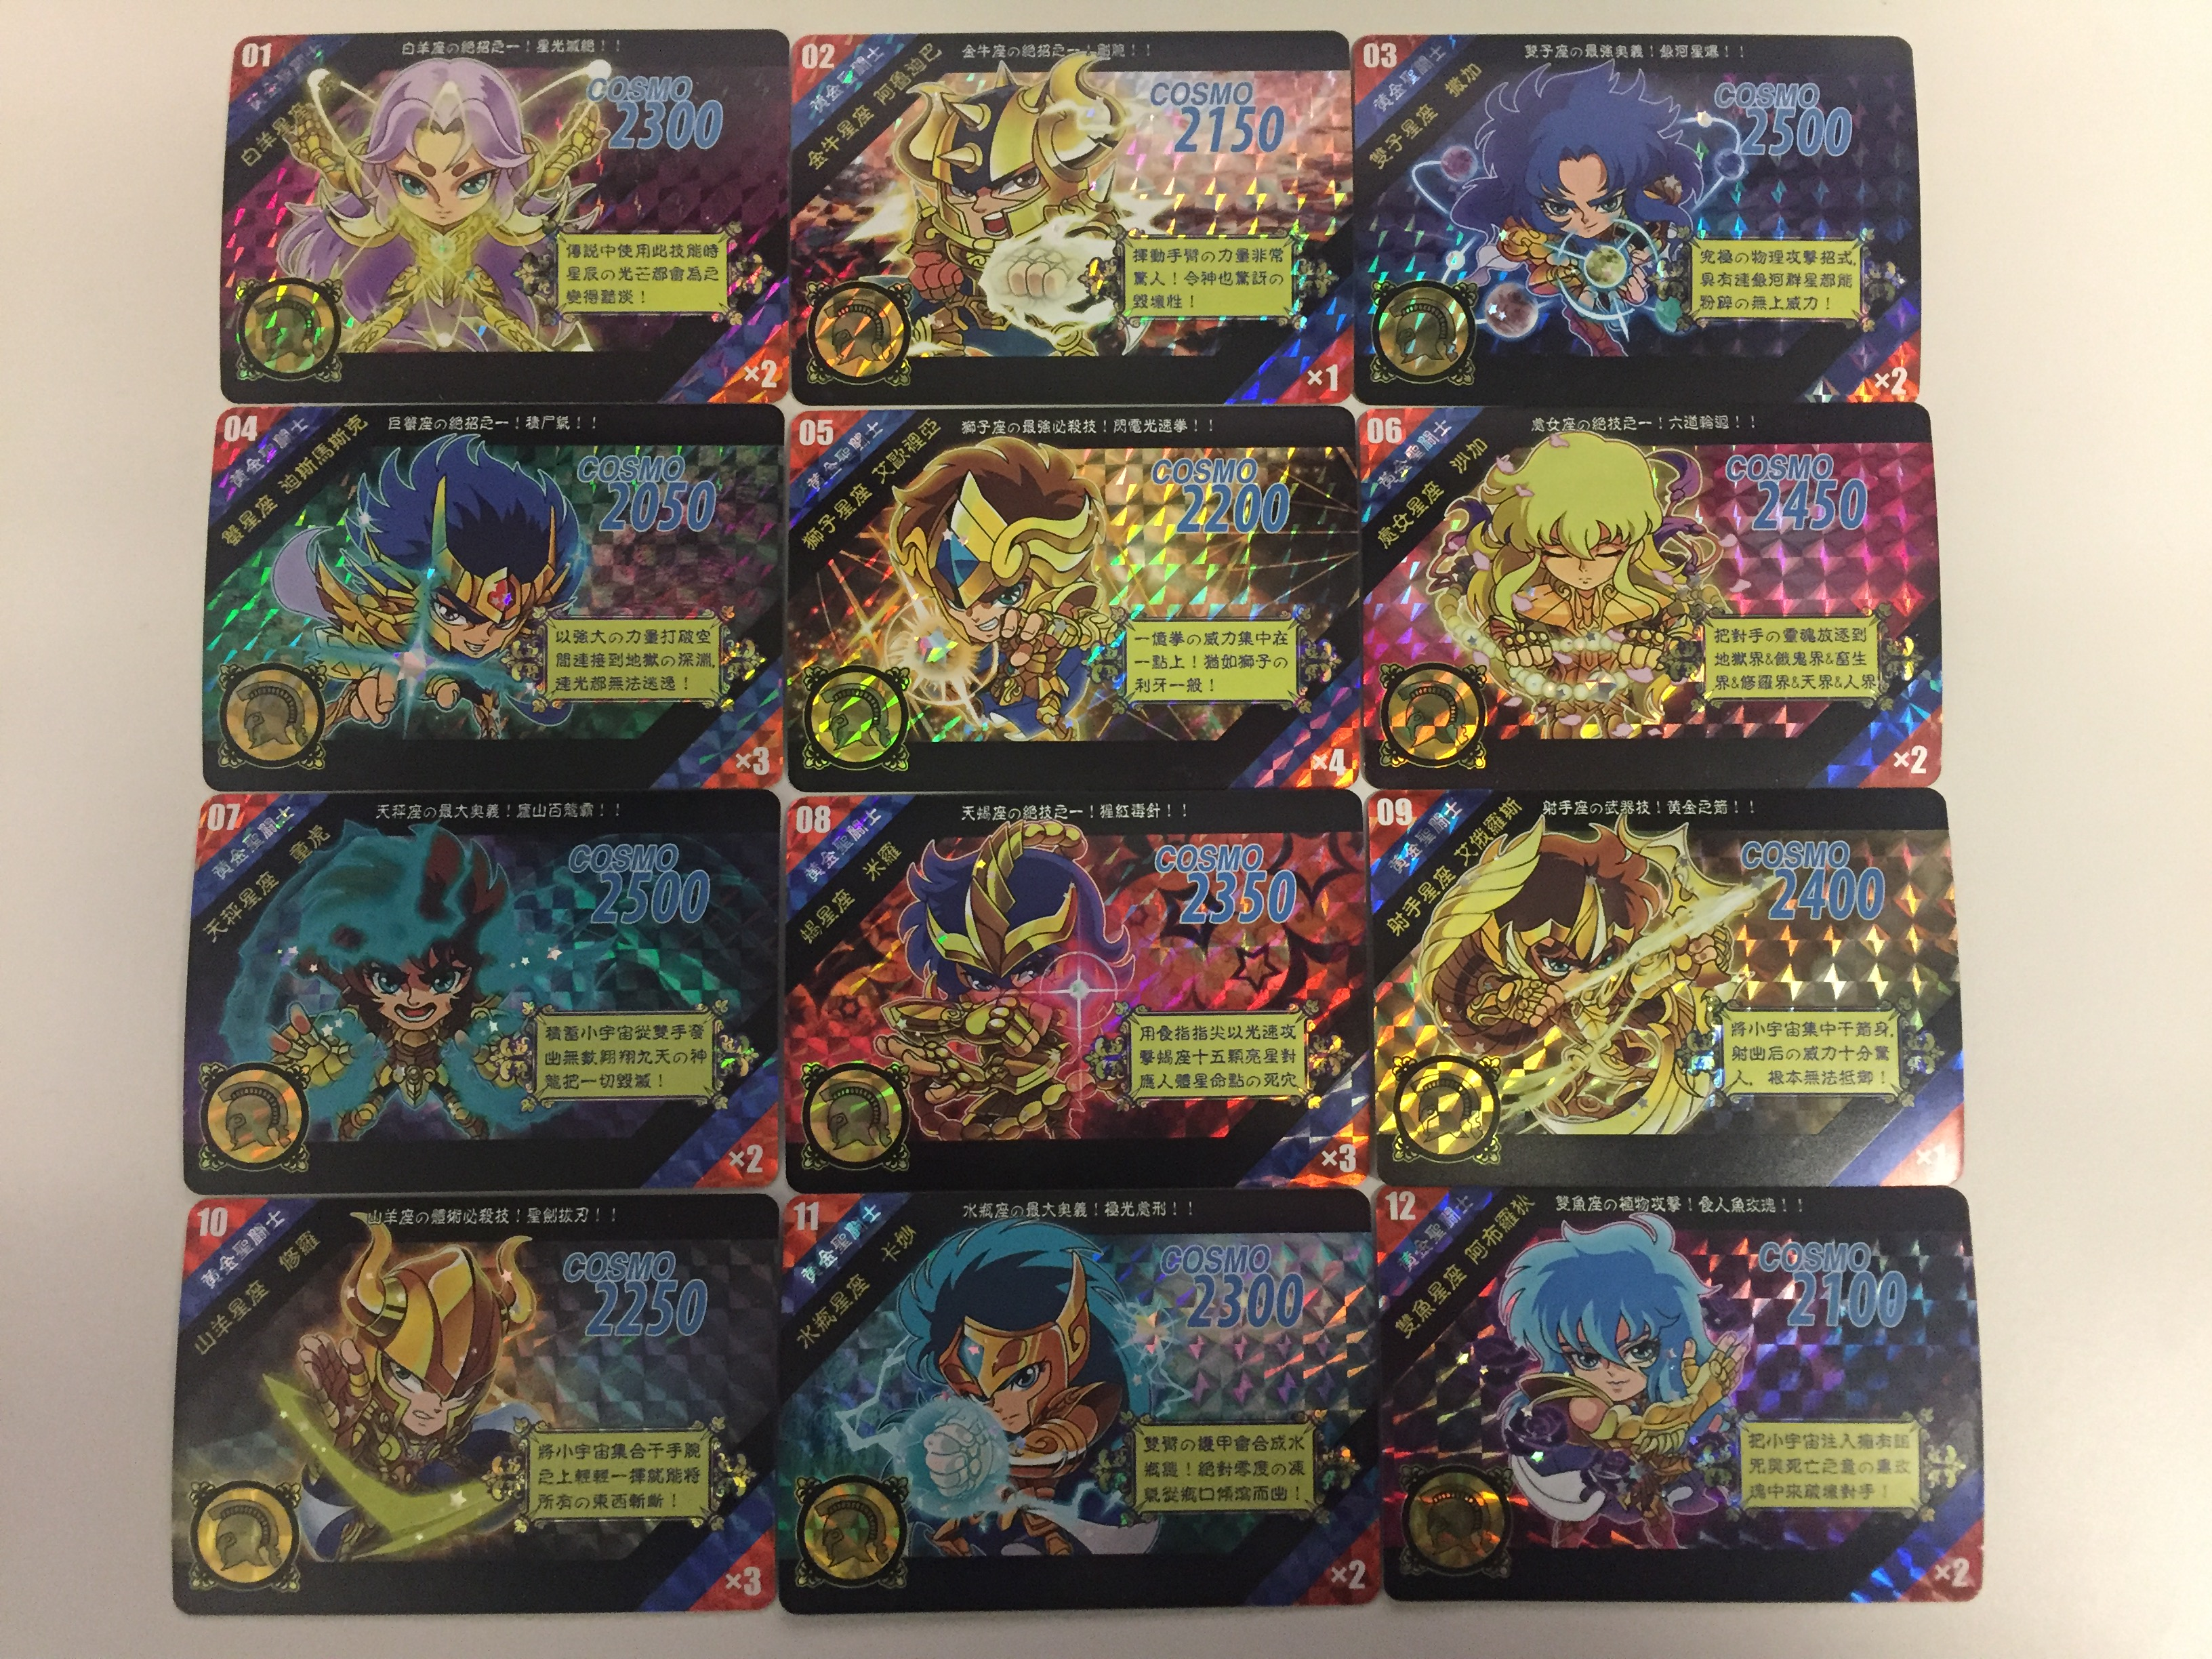 12pcs/set Saint Seiya Gold Saint Q Version Awakening Flash Card Toys Hobbies Hobby Collectibles Game Collection Cards